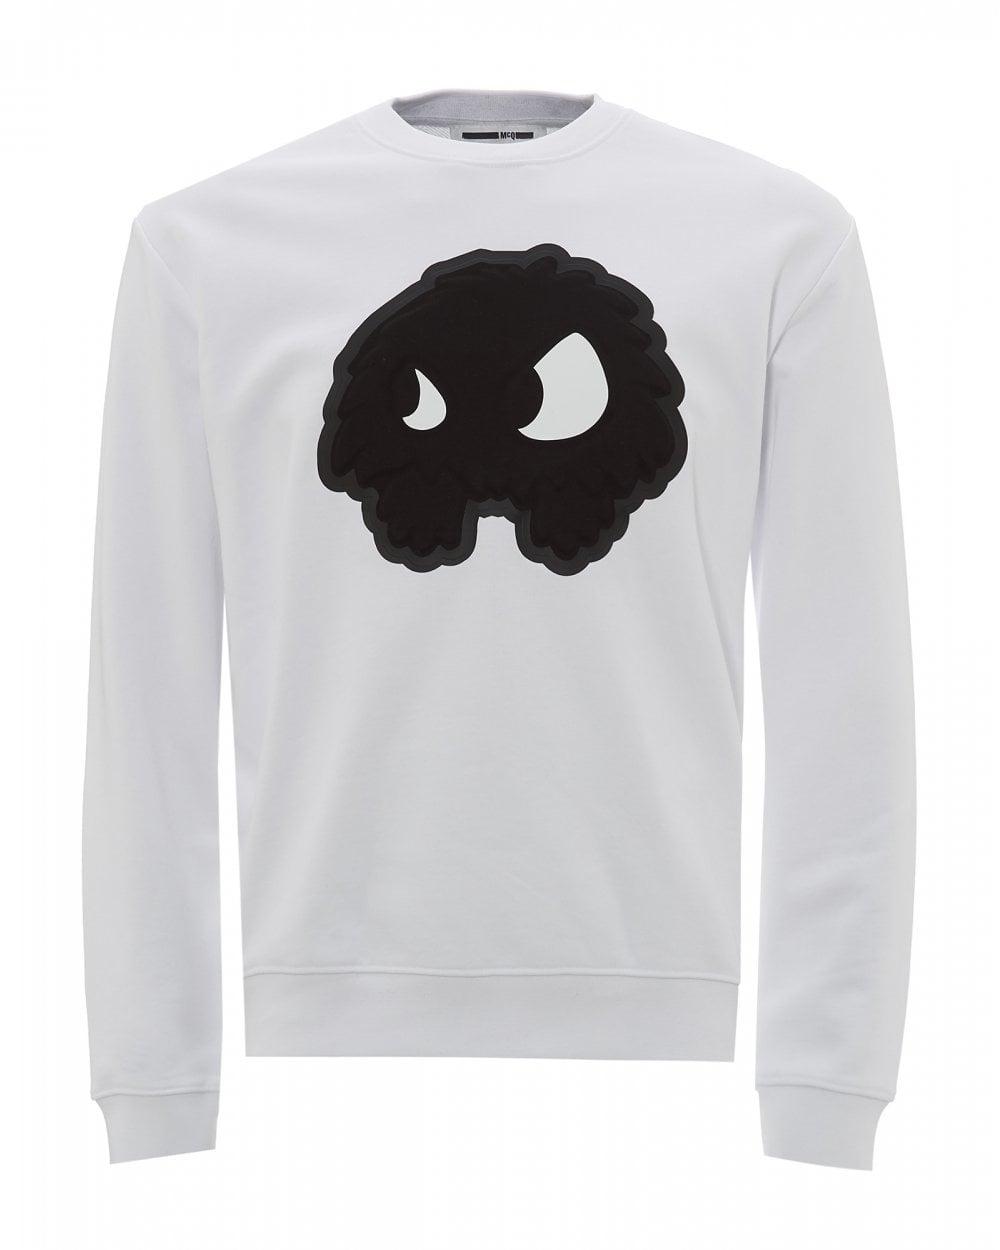 ba2744df982bd Mens Raised Fabric Monster Sweatshirt, White Sweat